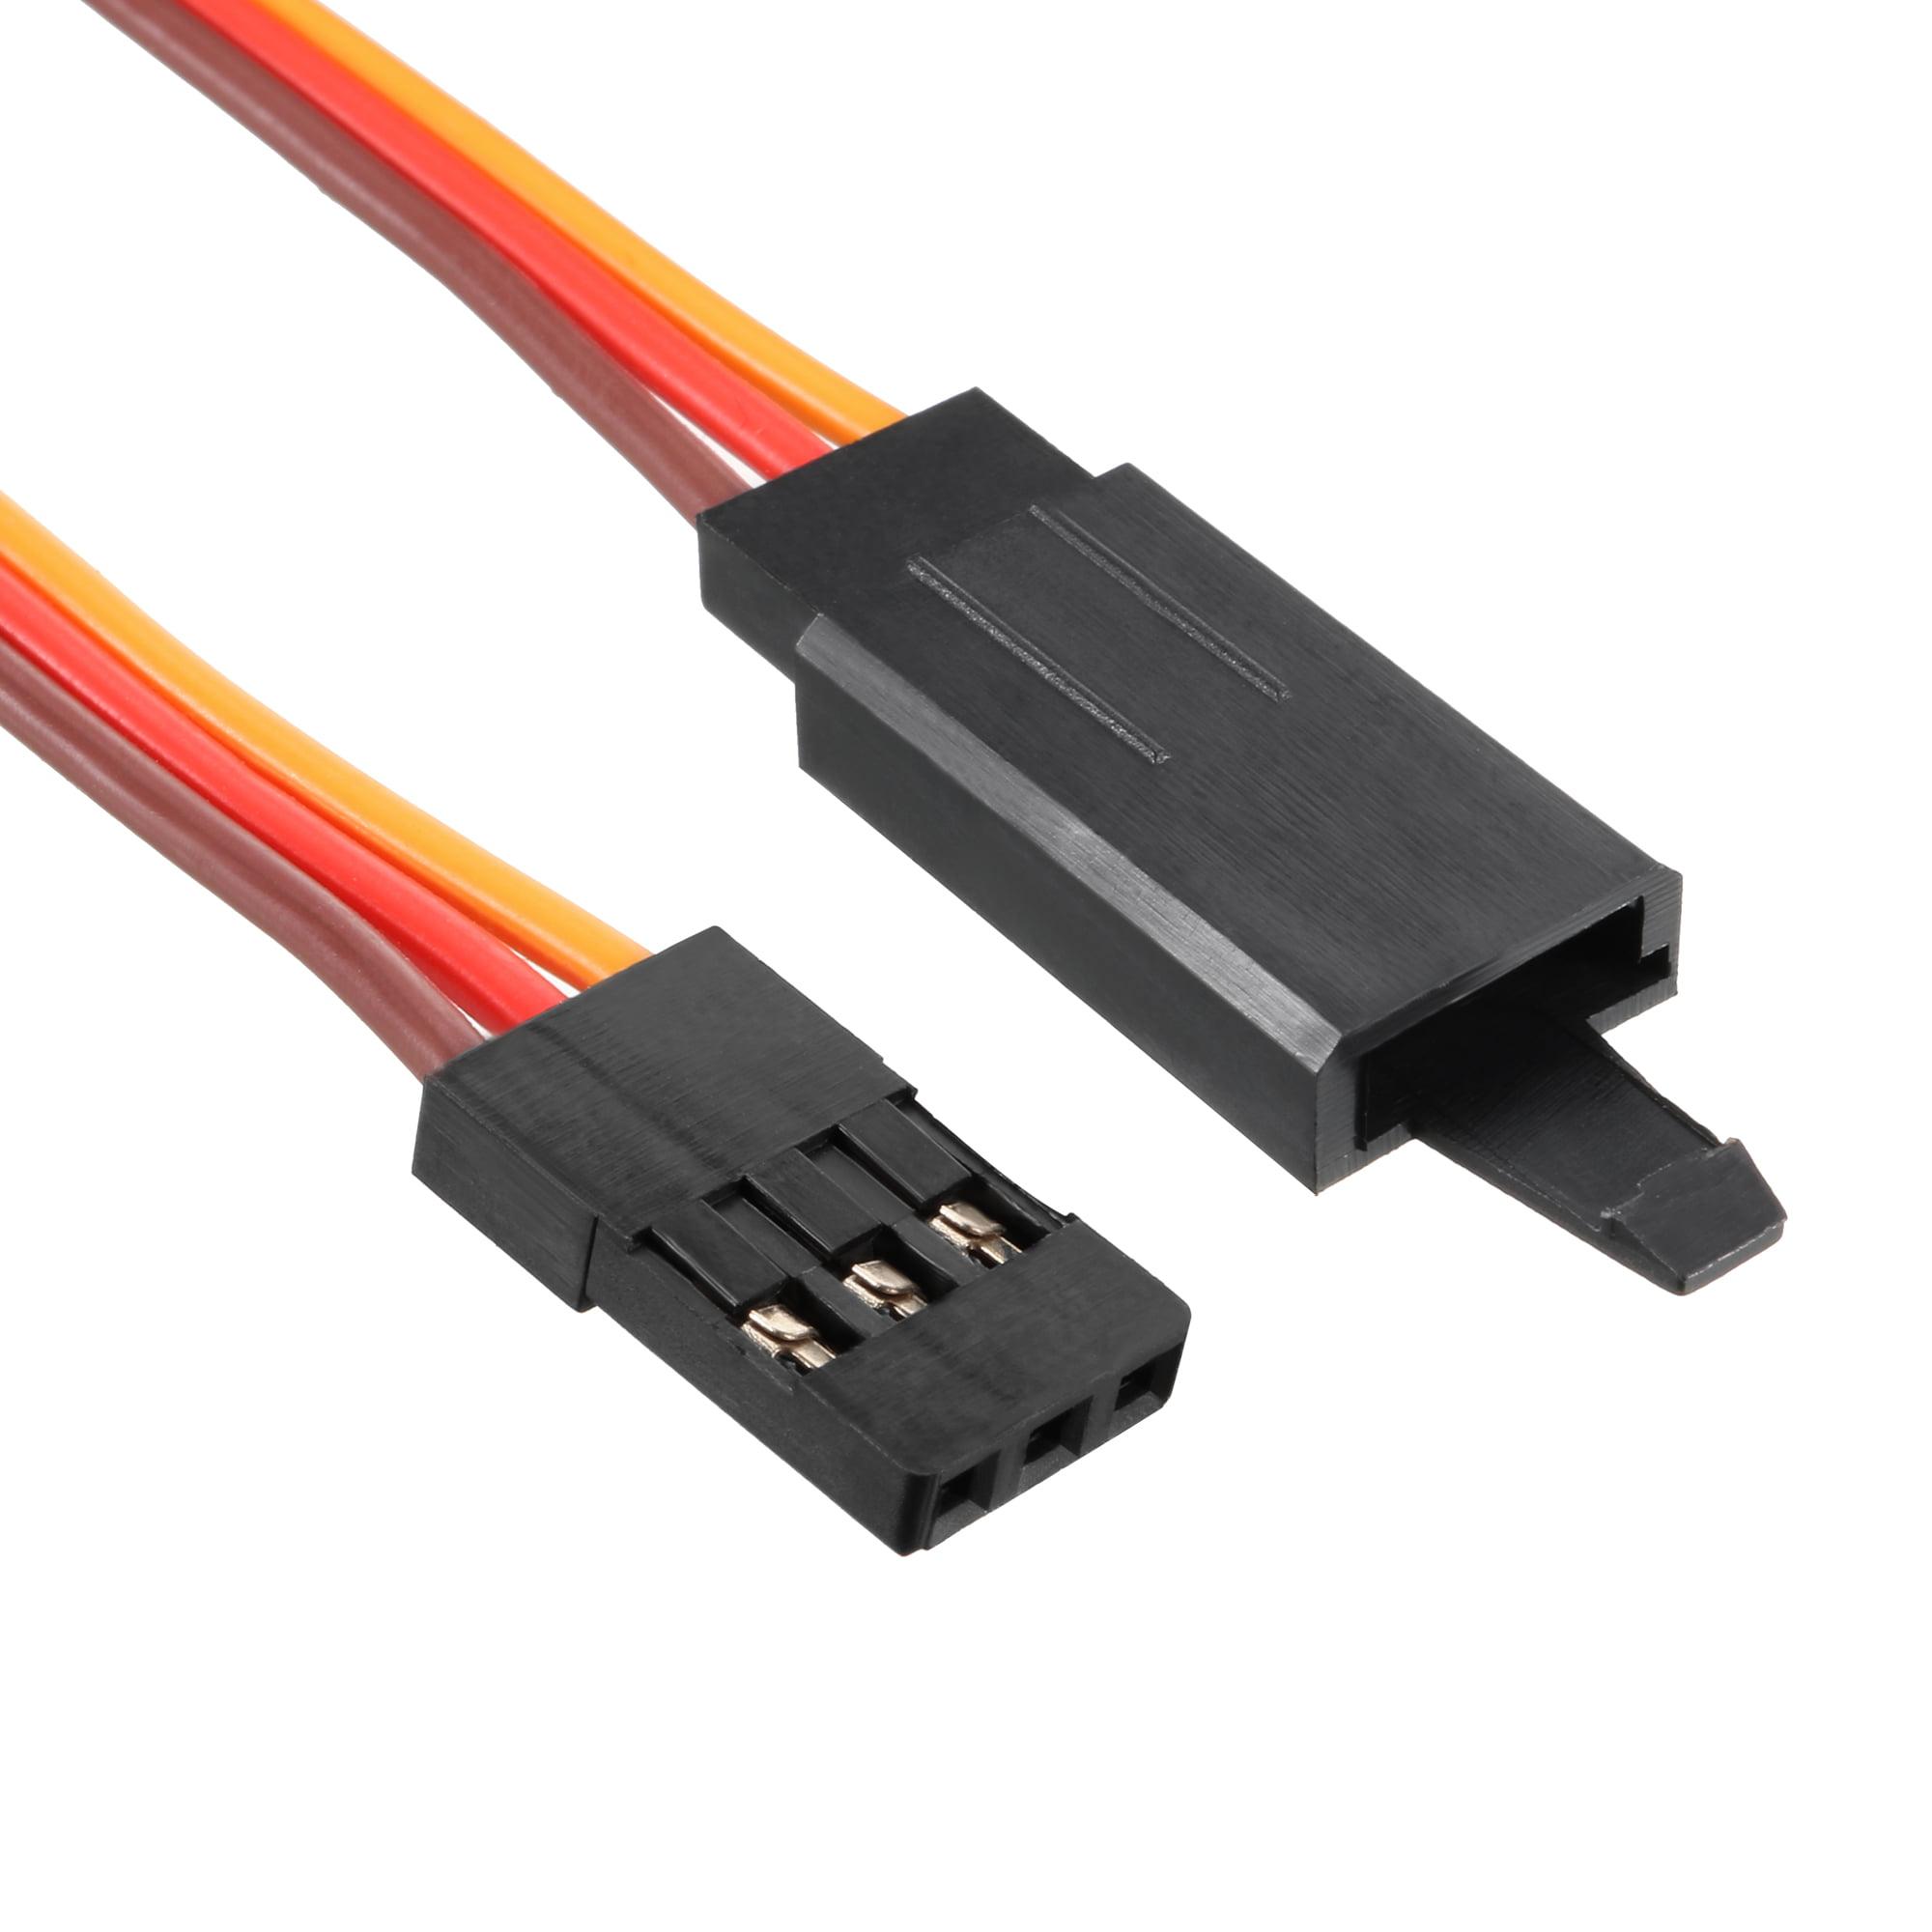 RC 3 Pin Compatible JR Hitec Servo Connector Female Plug Housing Black 10 No Pin